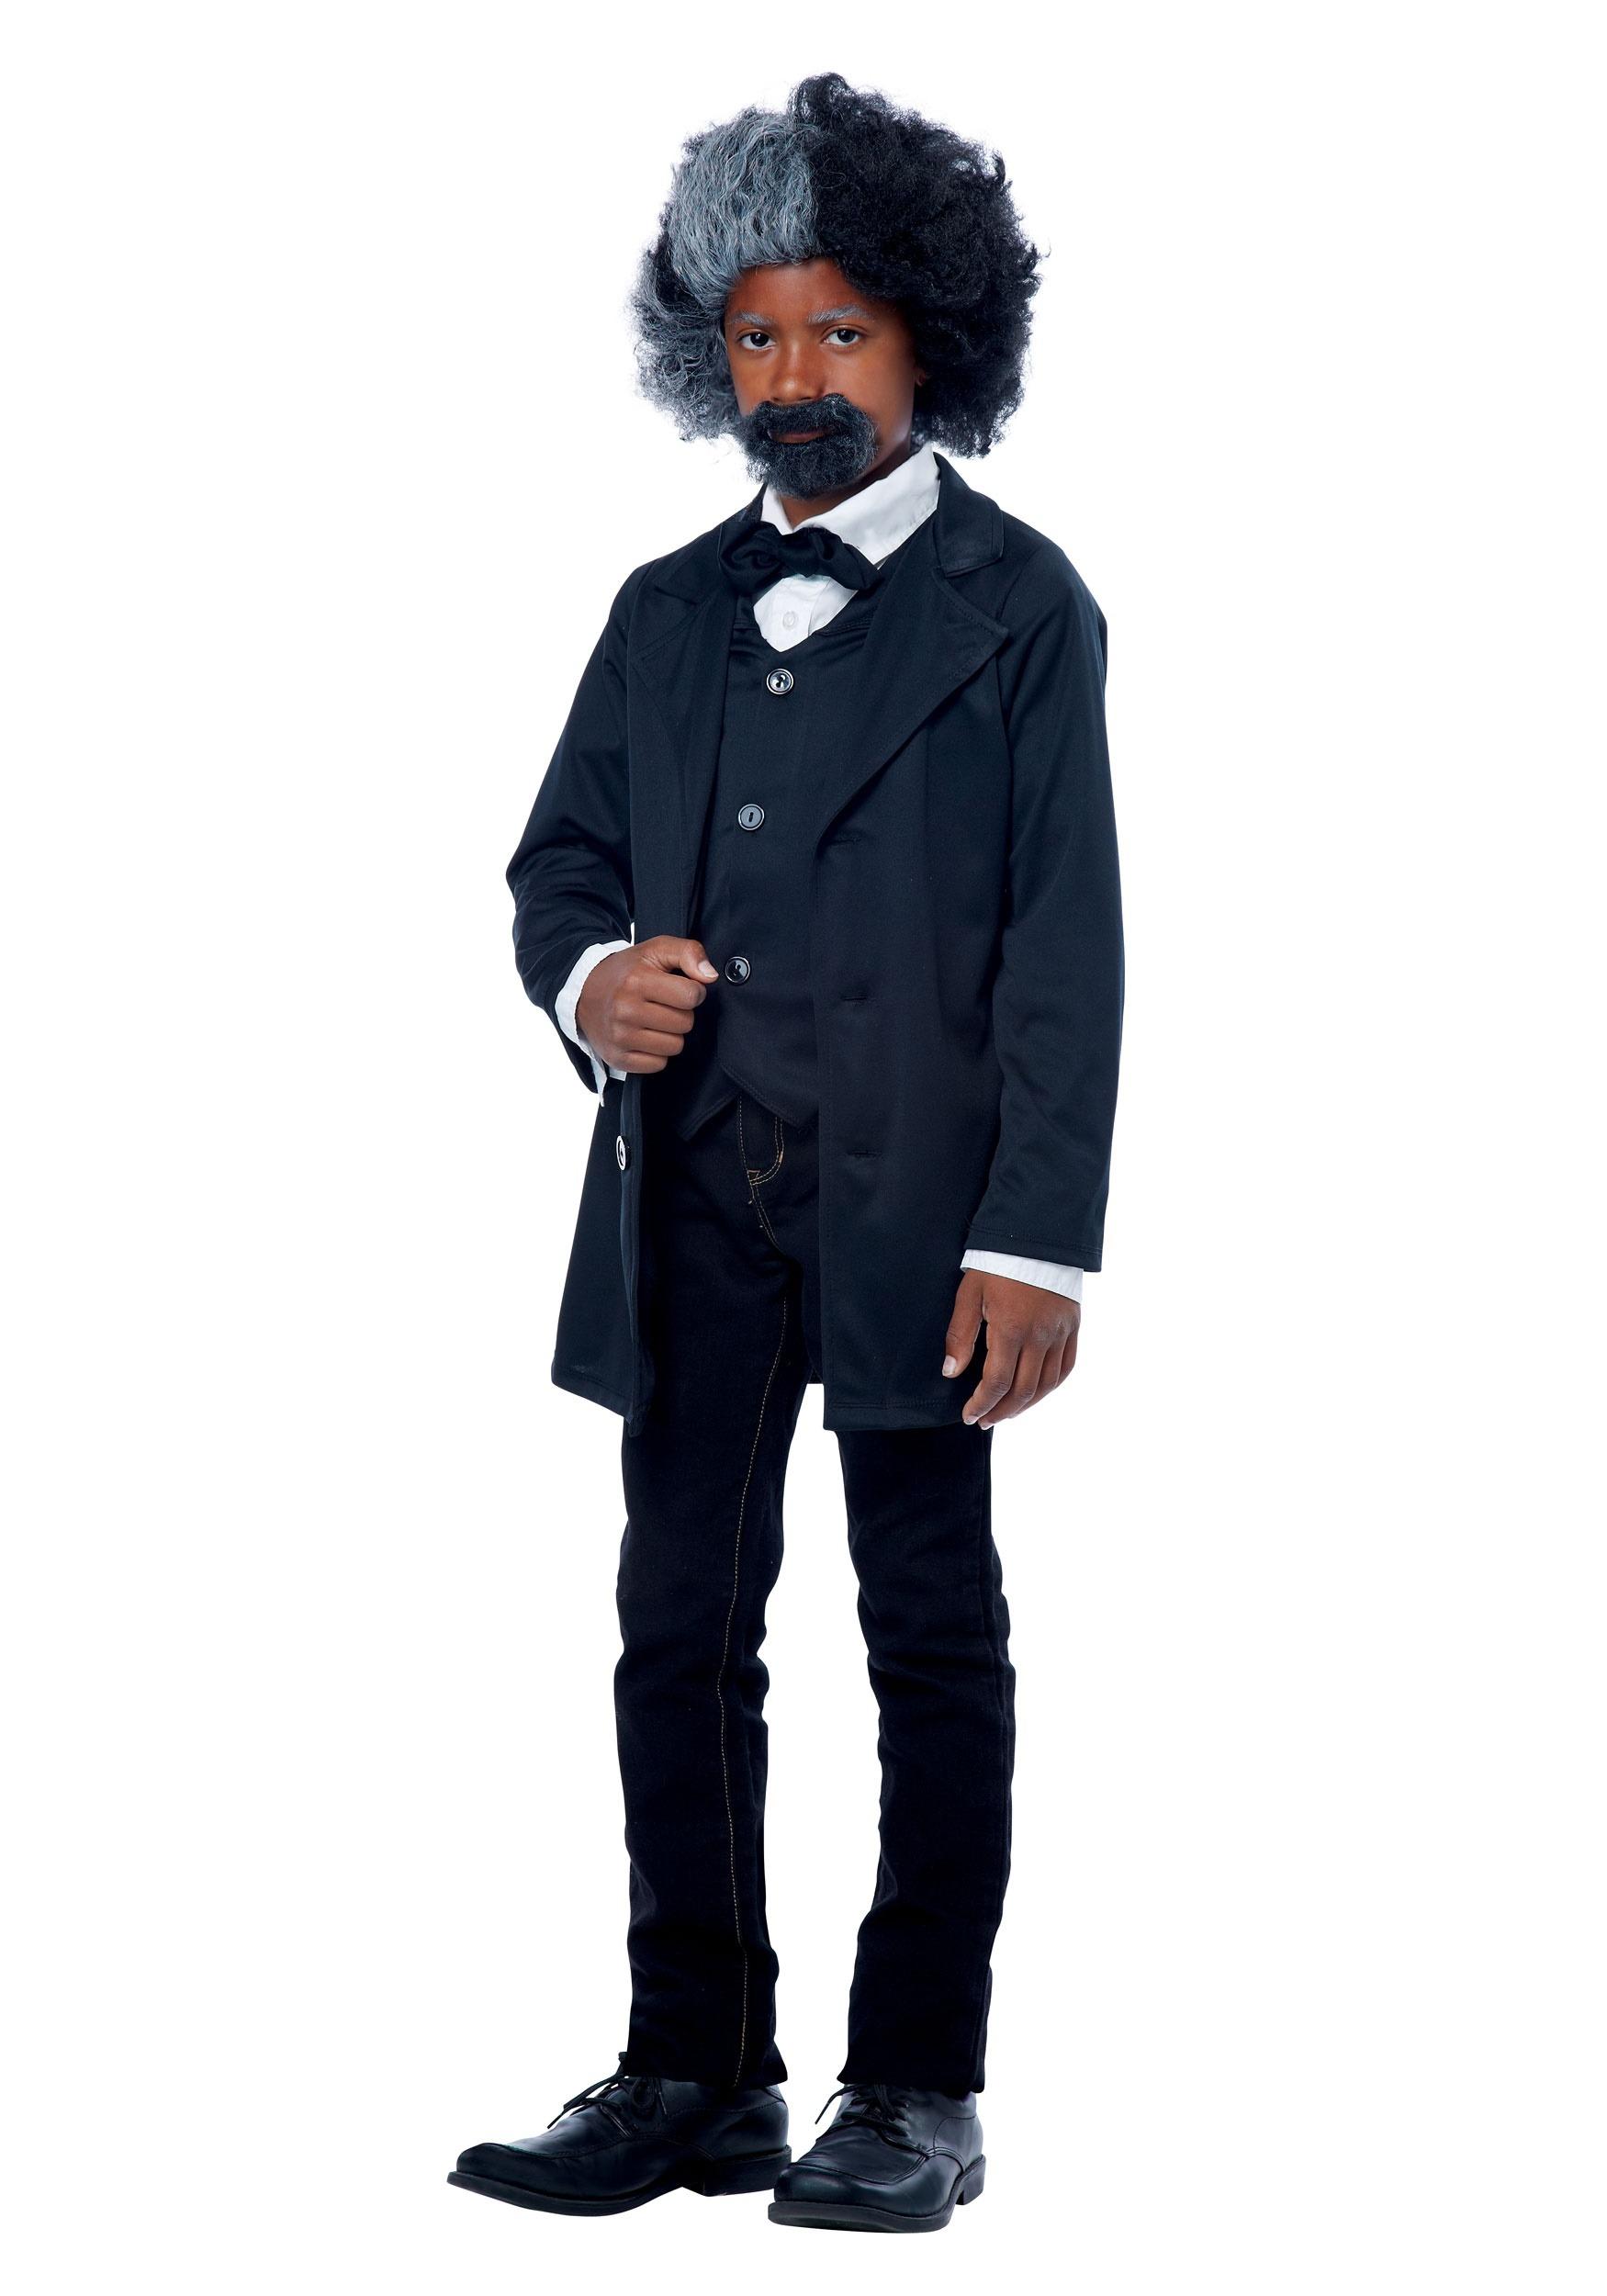 Boys Abraham Lincoln Costume1 Boys Abraham Lincoln Costume2  sc 1 st  Halloween Costumes & Boys Abraham Lincoln Costume